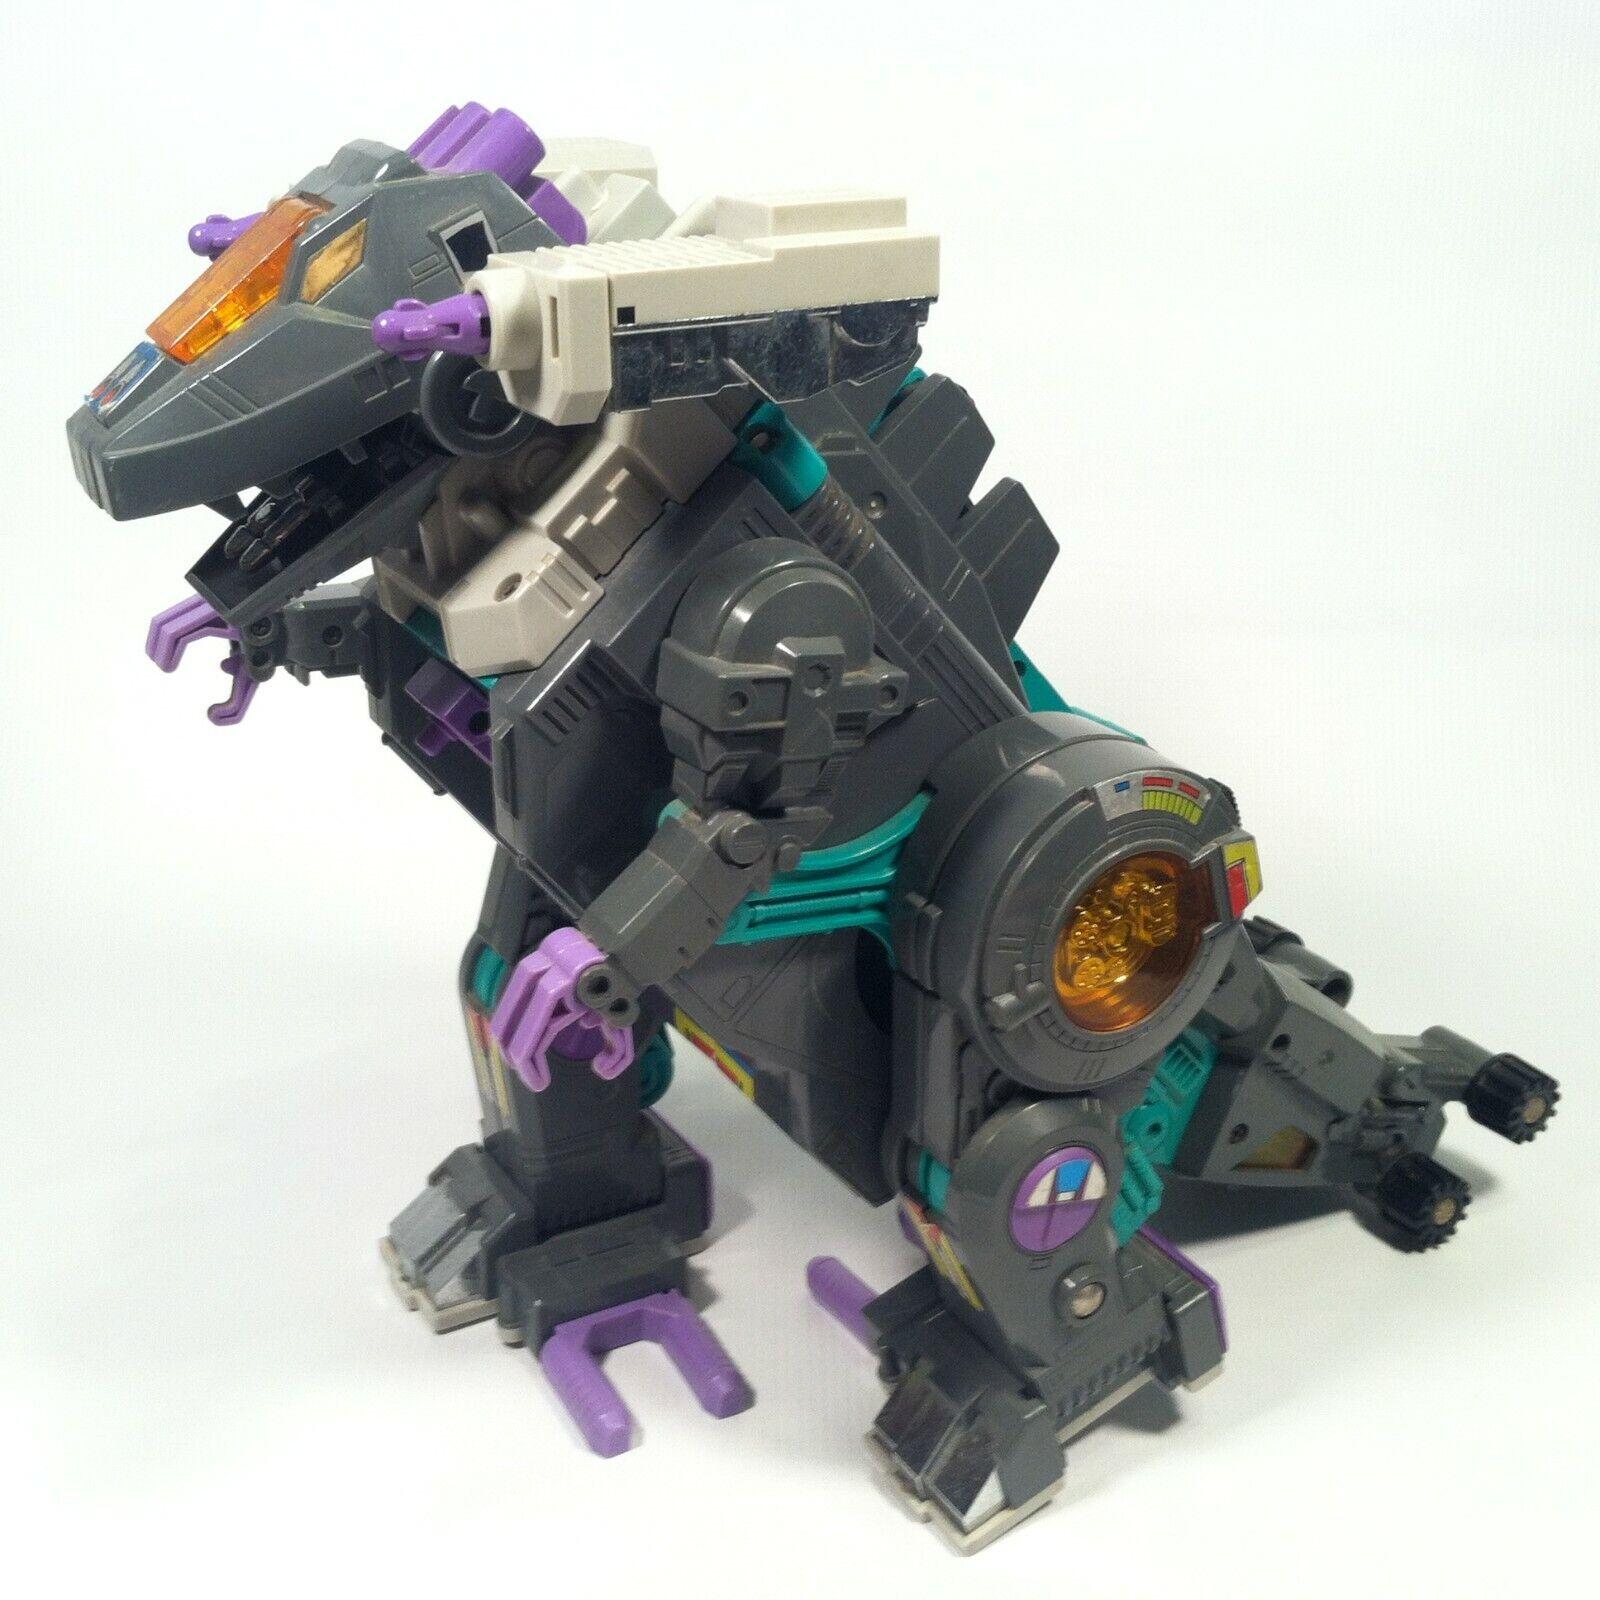 hermoso Vintage Figura Figura Figura de Transformers G1 Trypticon sólo  alto descuento